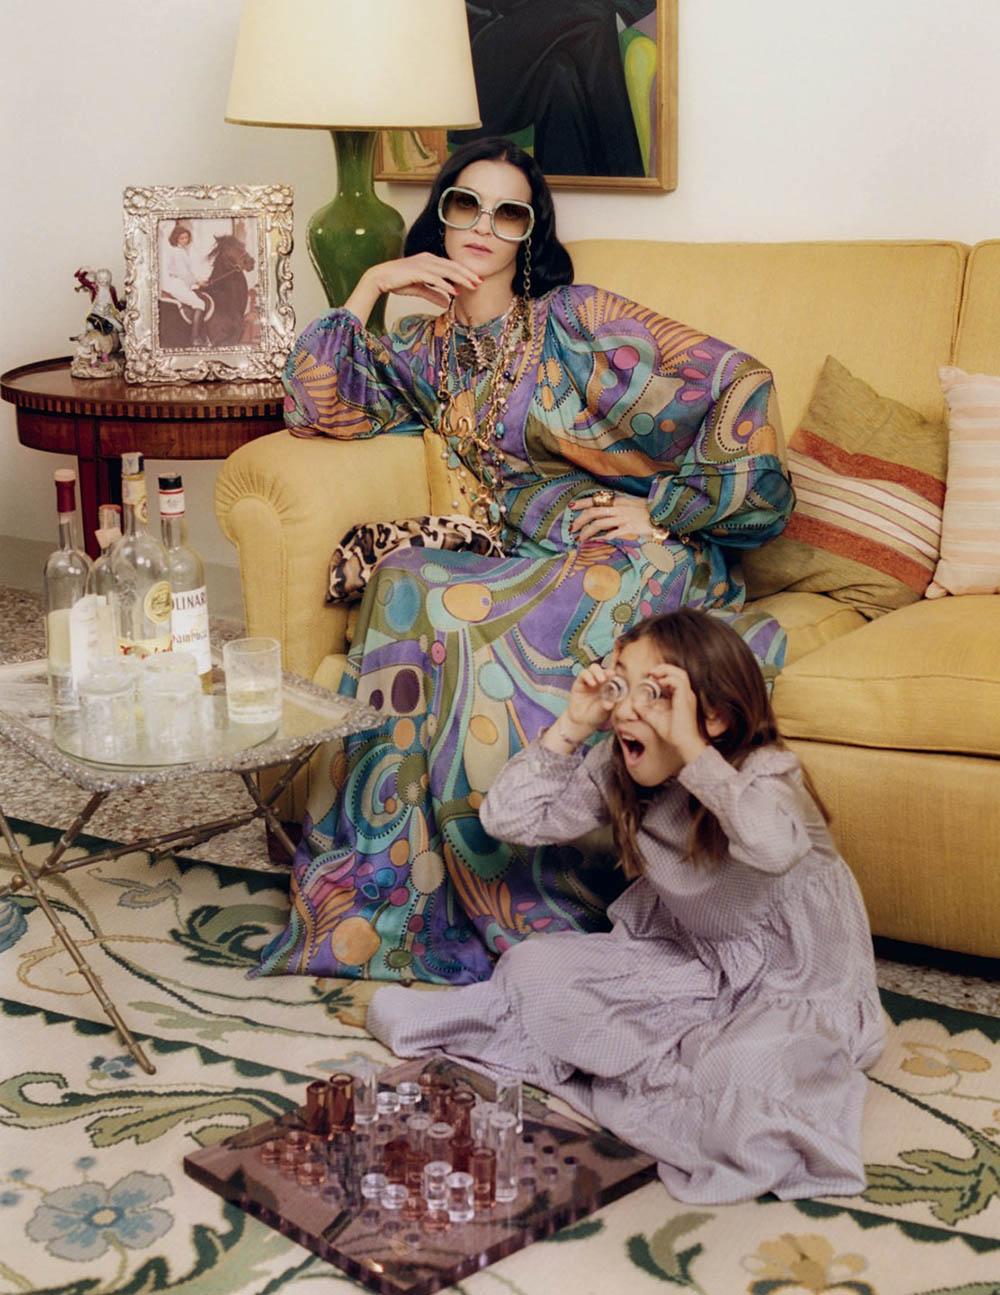 Mariacarla Boscono by Venetia Scott for British Vogue February 2020